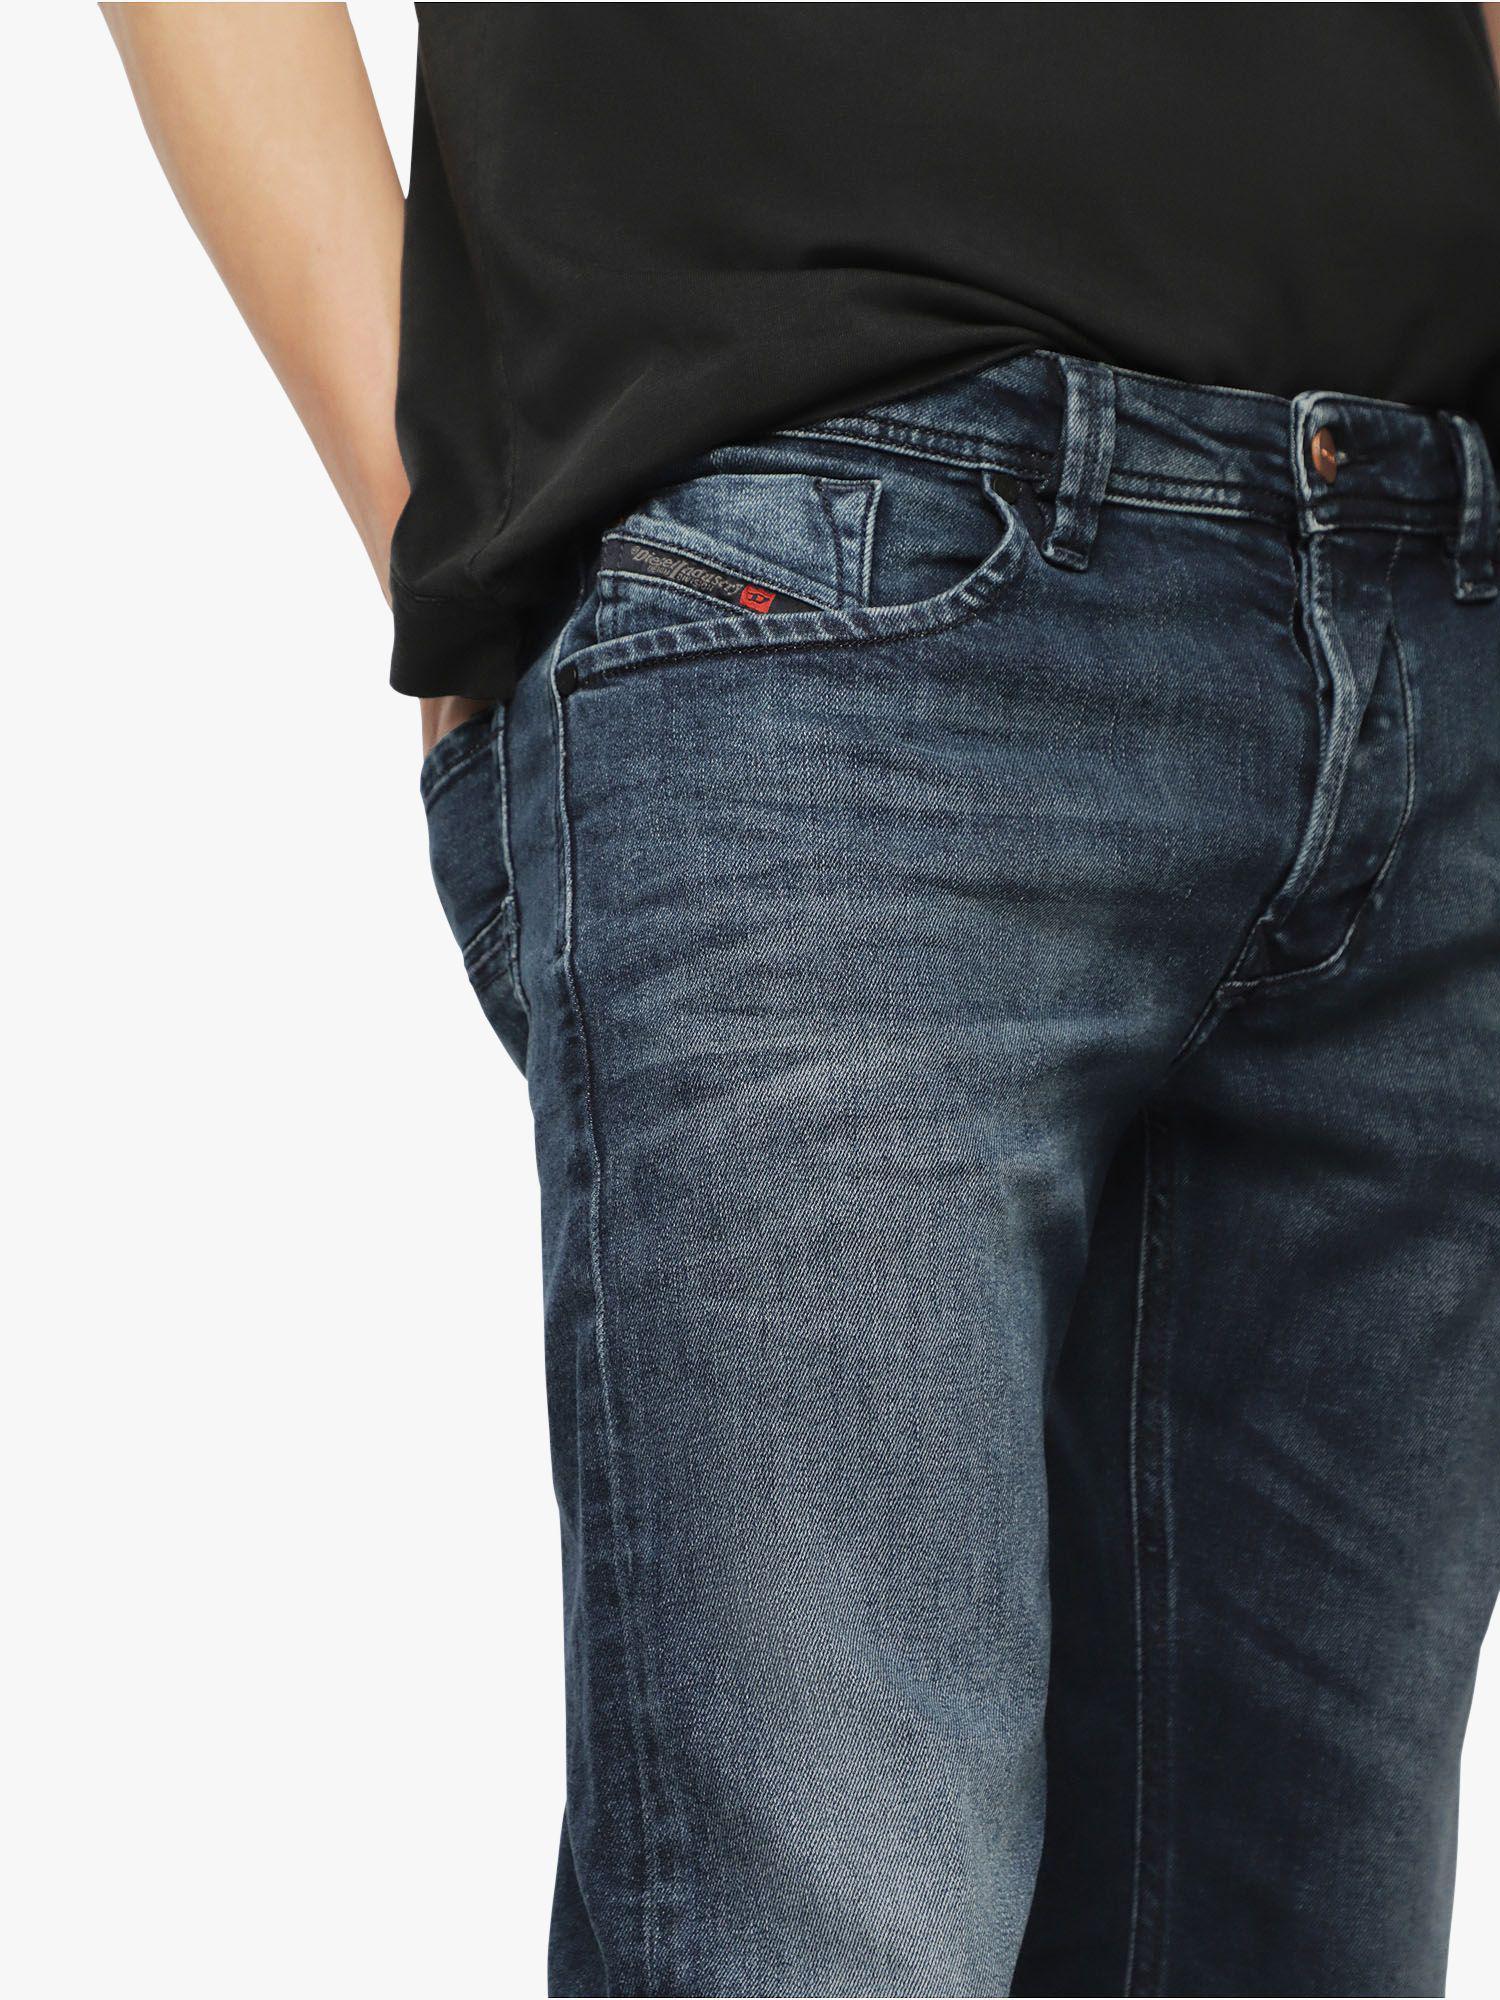 c36ec437 DIESEL Larkee 087as Straight Jeans in Blue for Men - Save 40% - Lyst